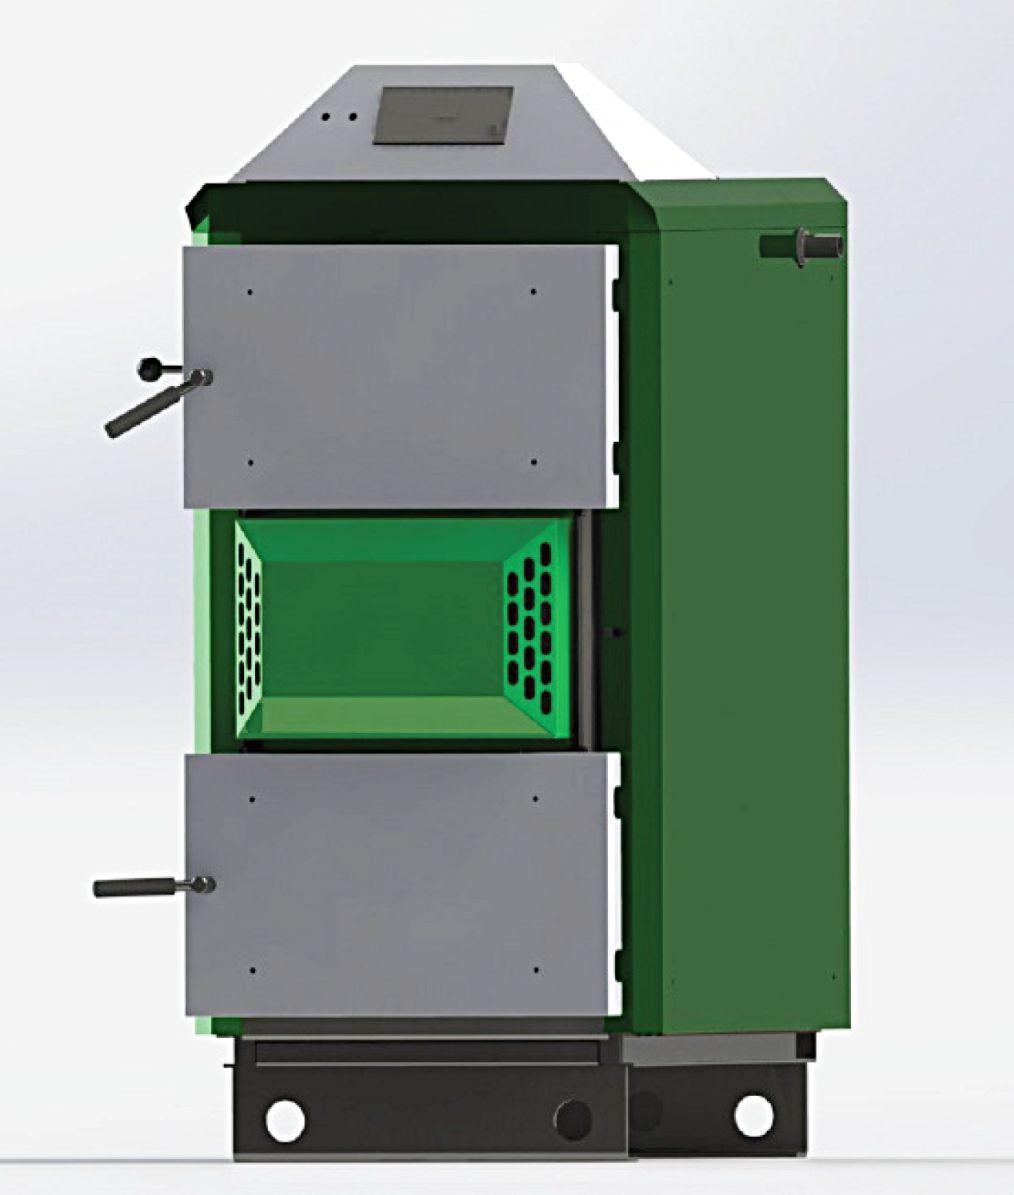 Wood gasifying boiler Orlan 18 Super D